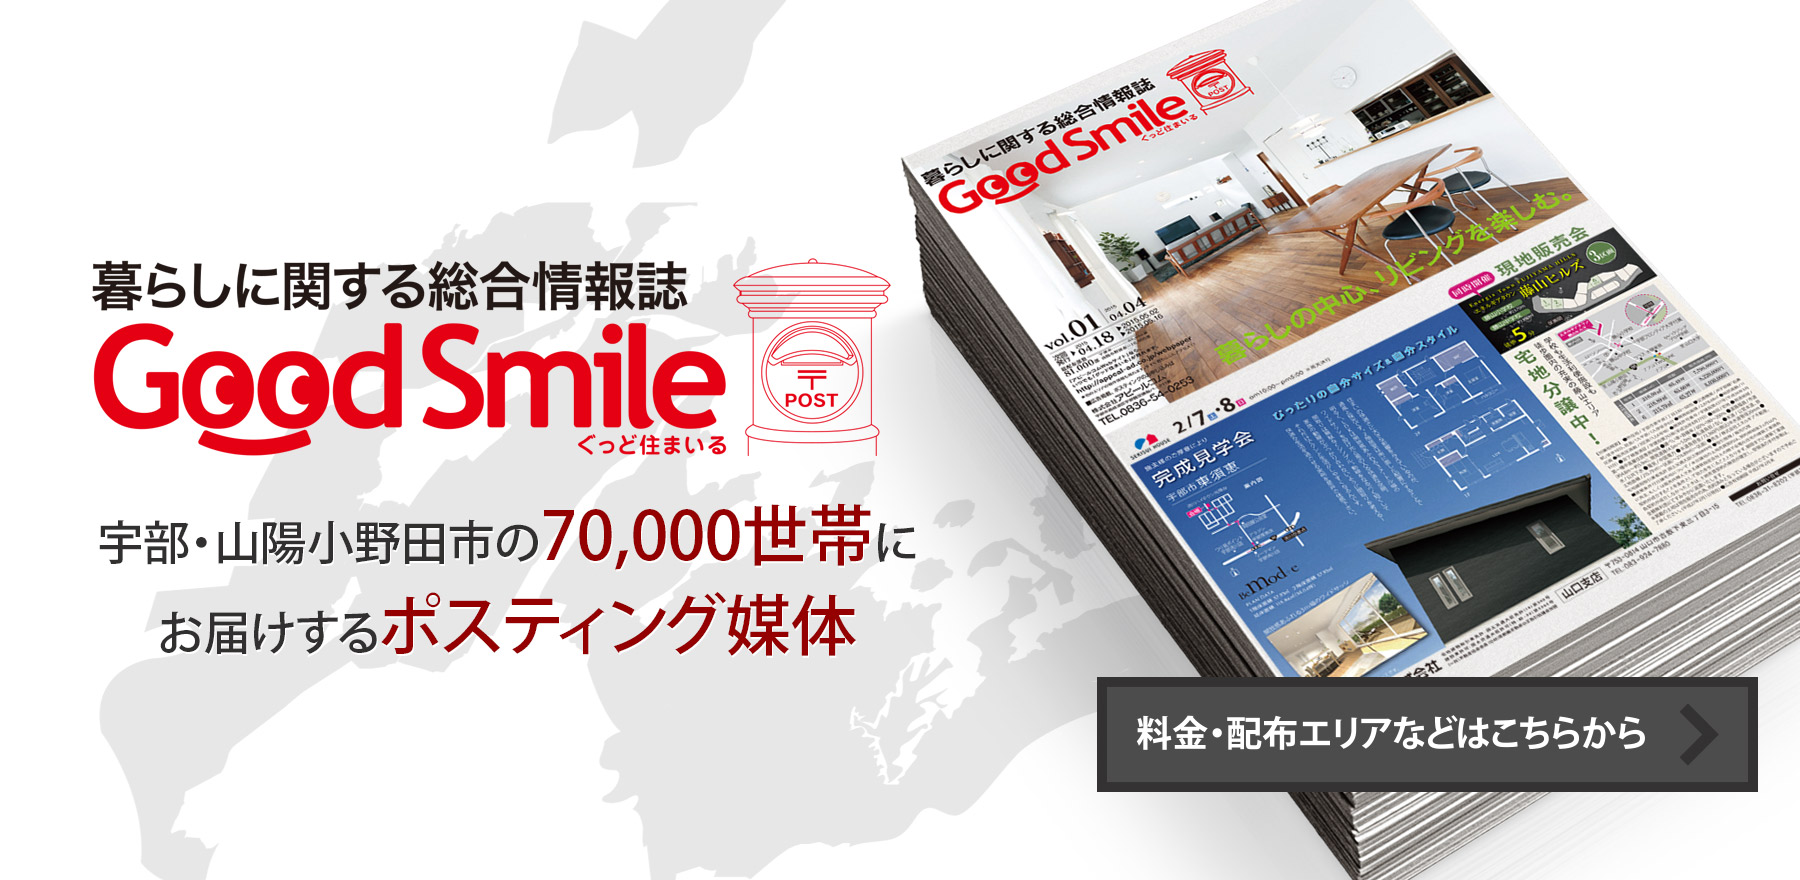 goodsmile_eye